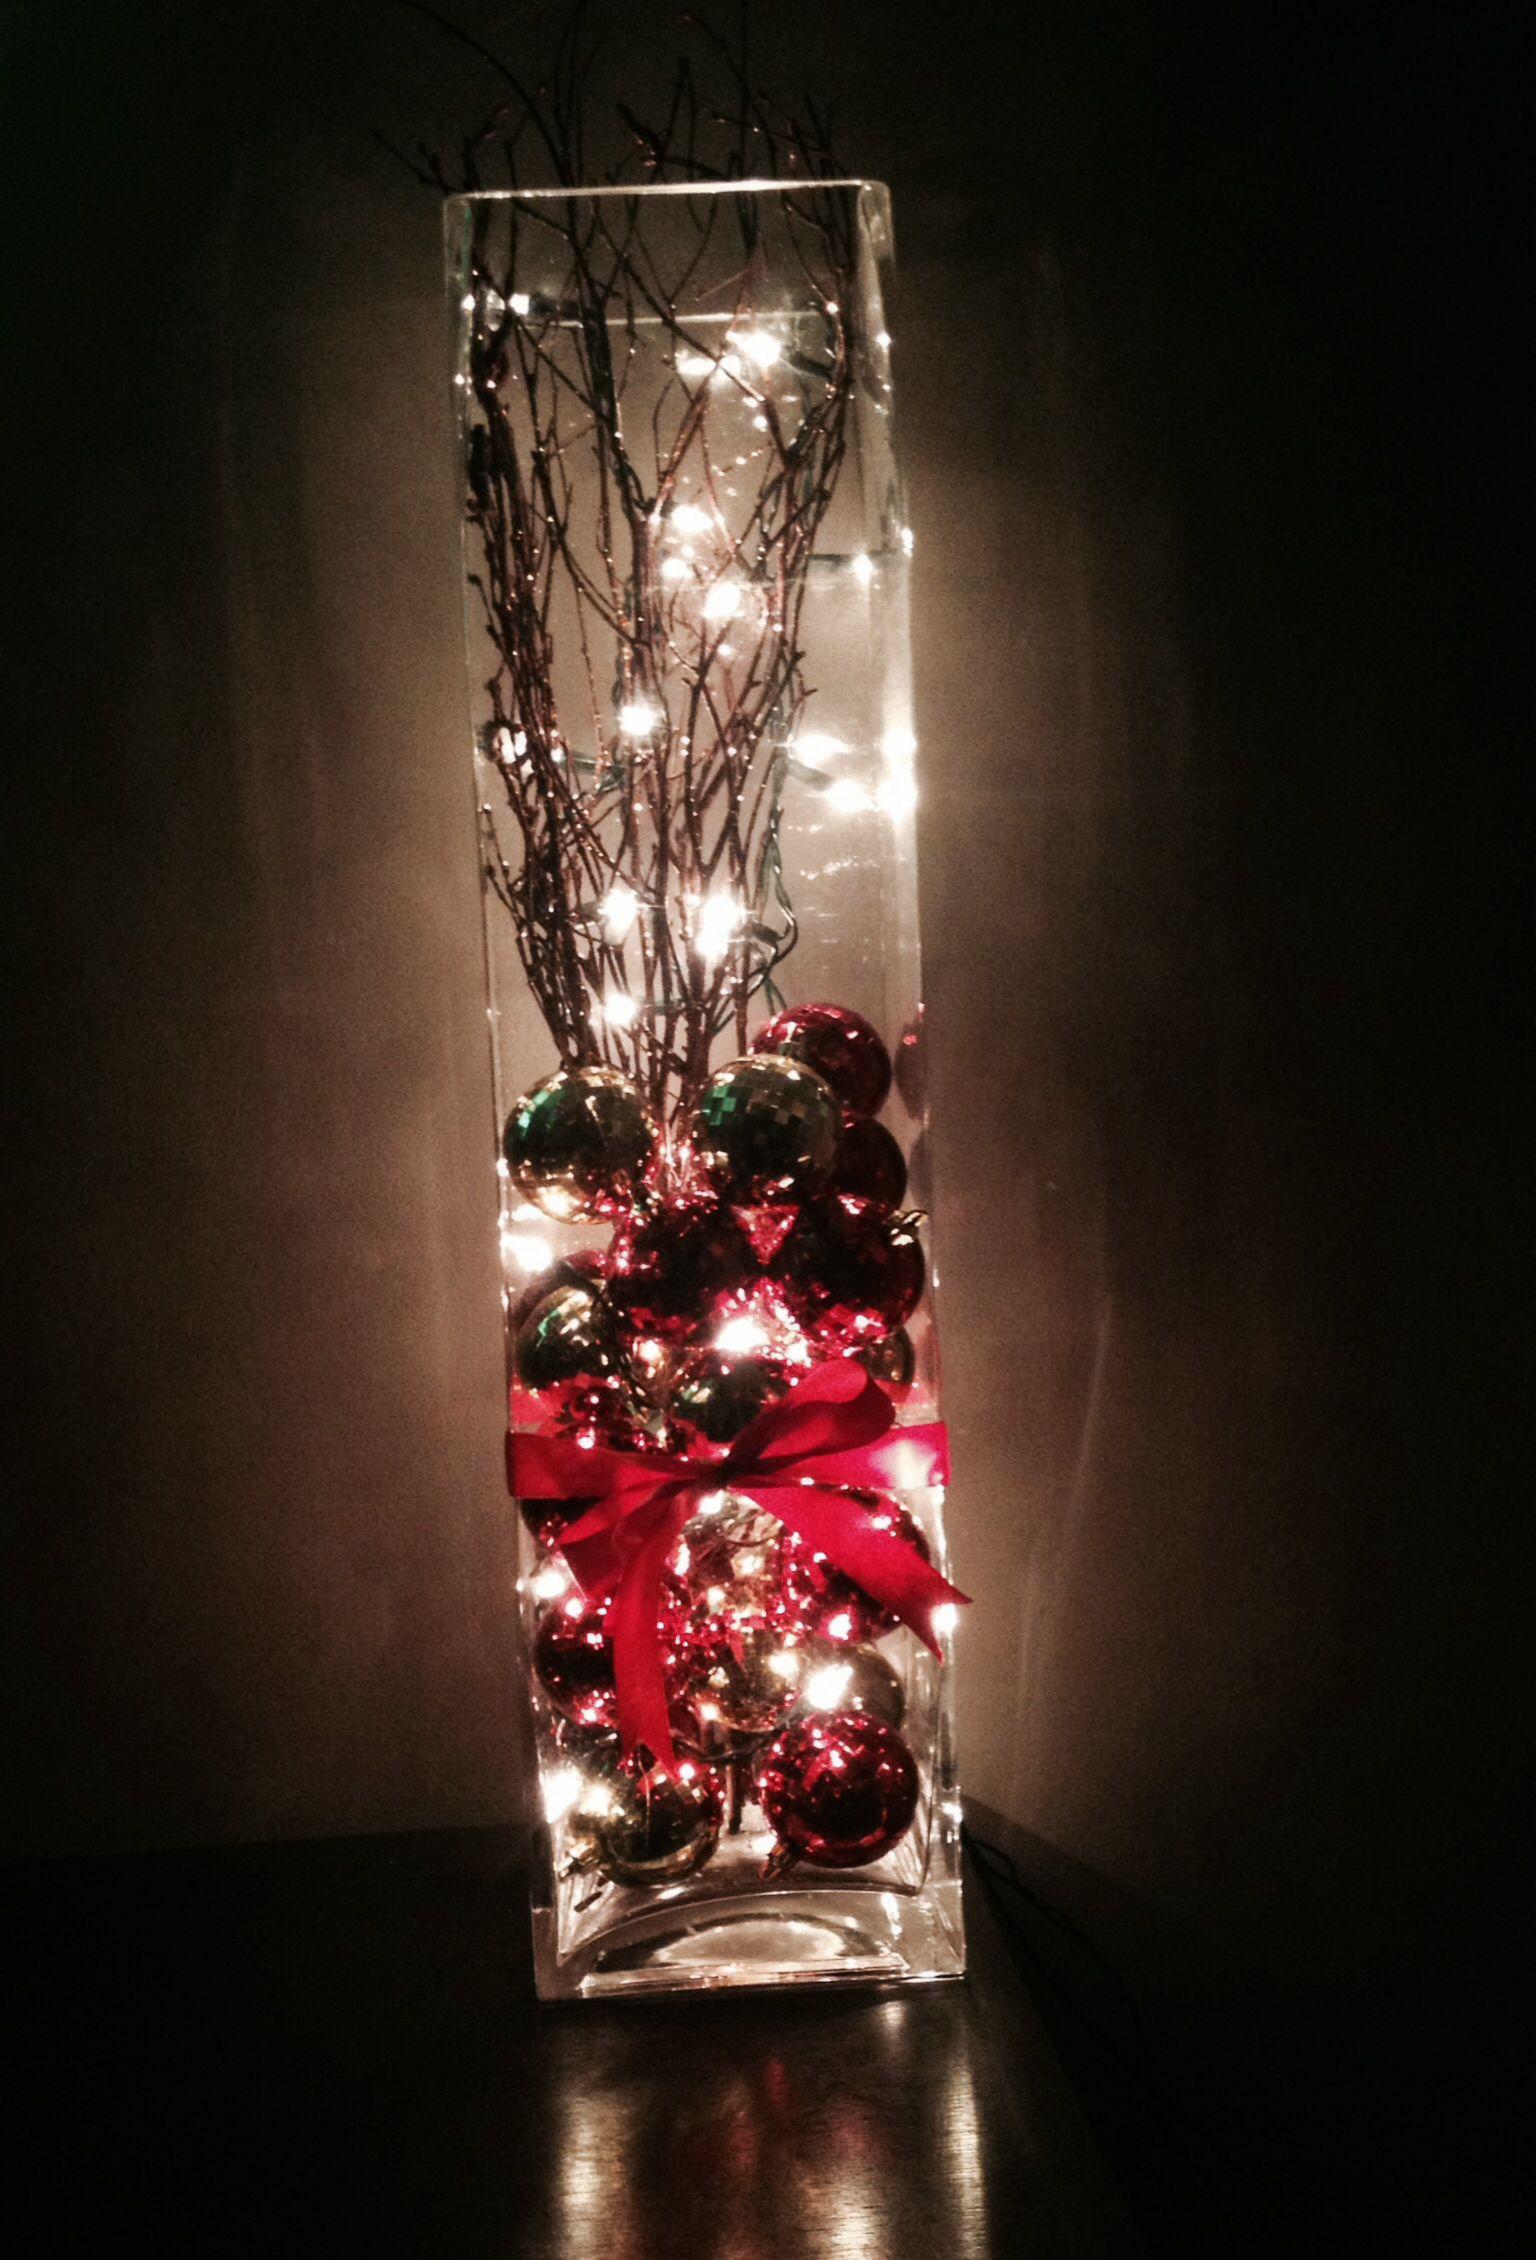 Homemade Christmas decor. Made with left over lights and